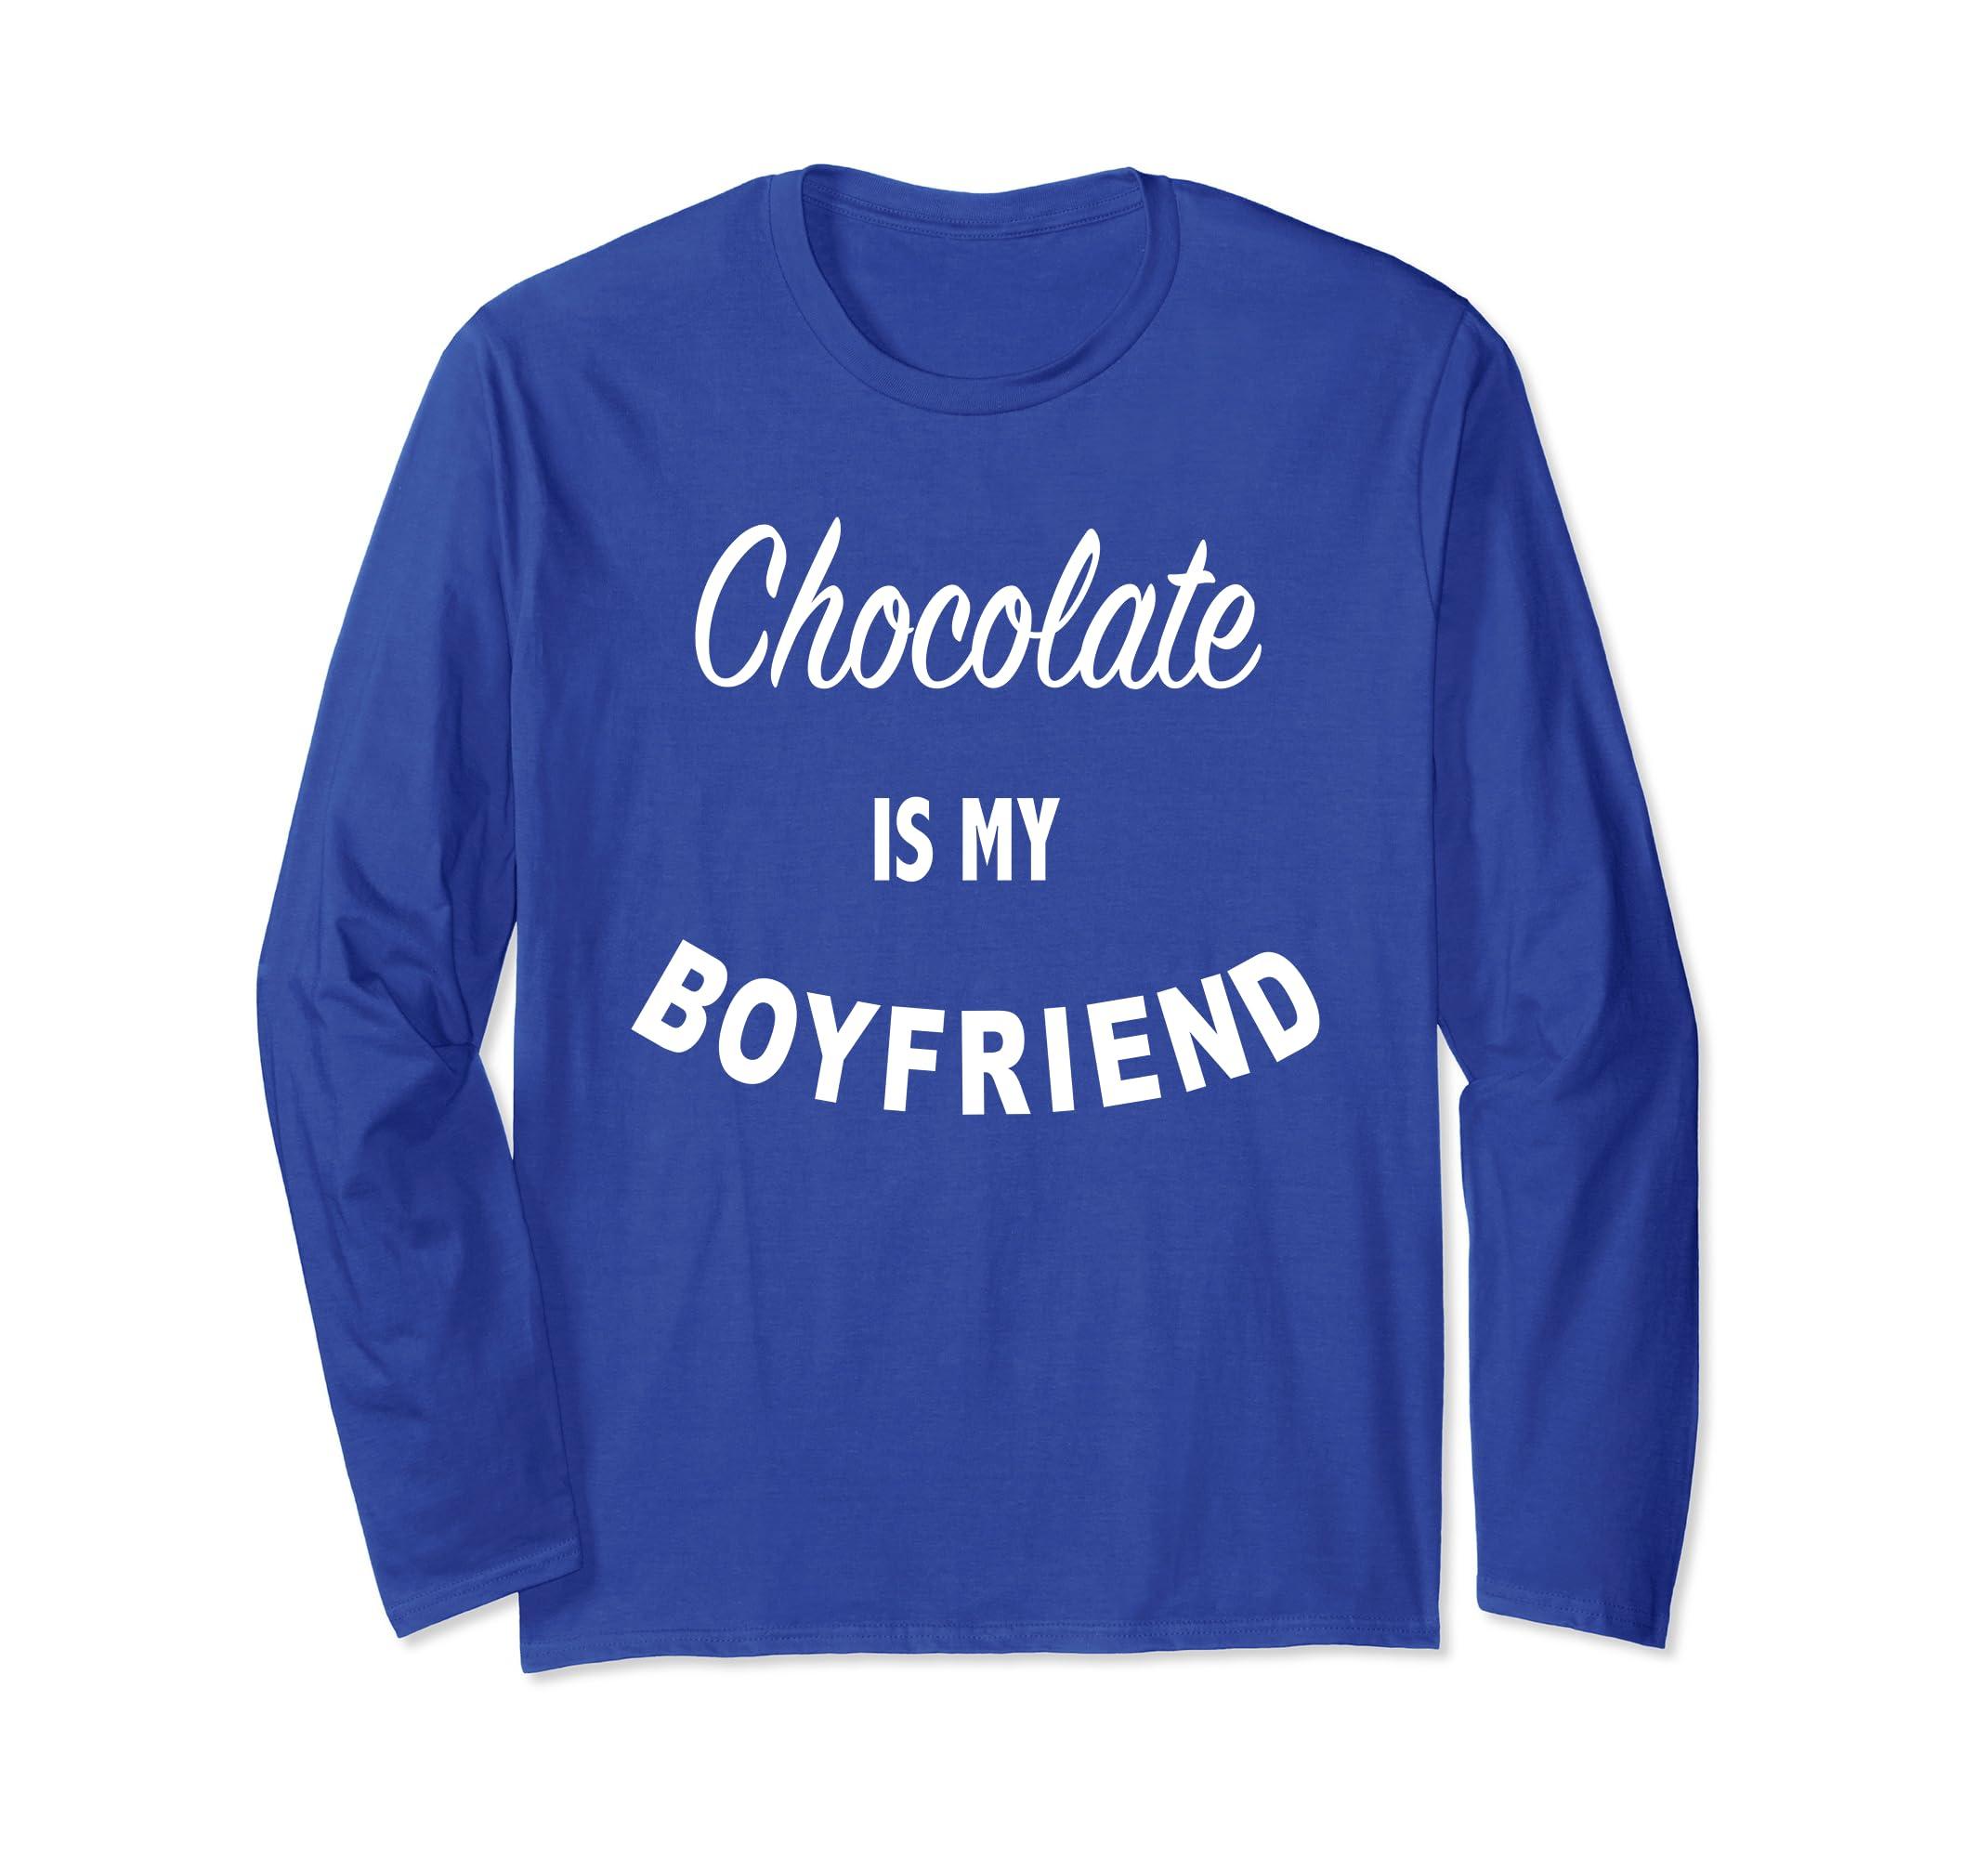 Chocolate Is My Boyfriend   Funny Chocoholic Slogan T Shirt-ln